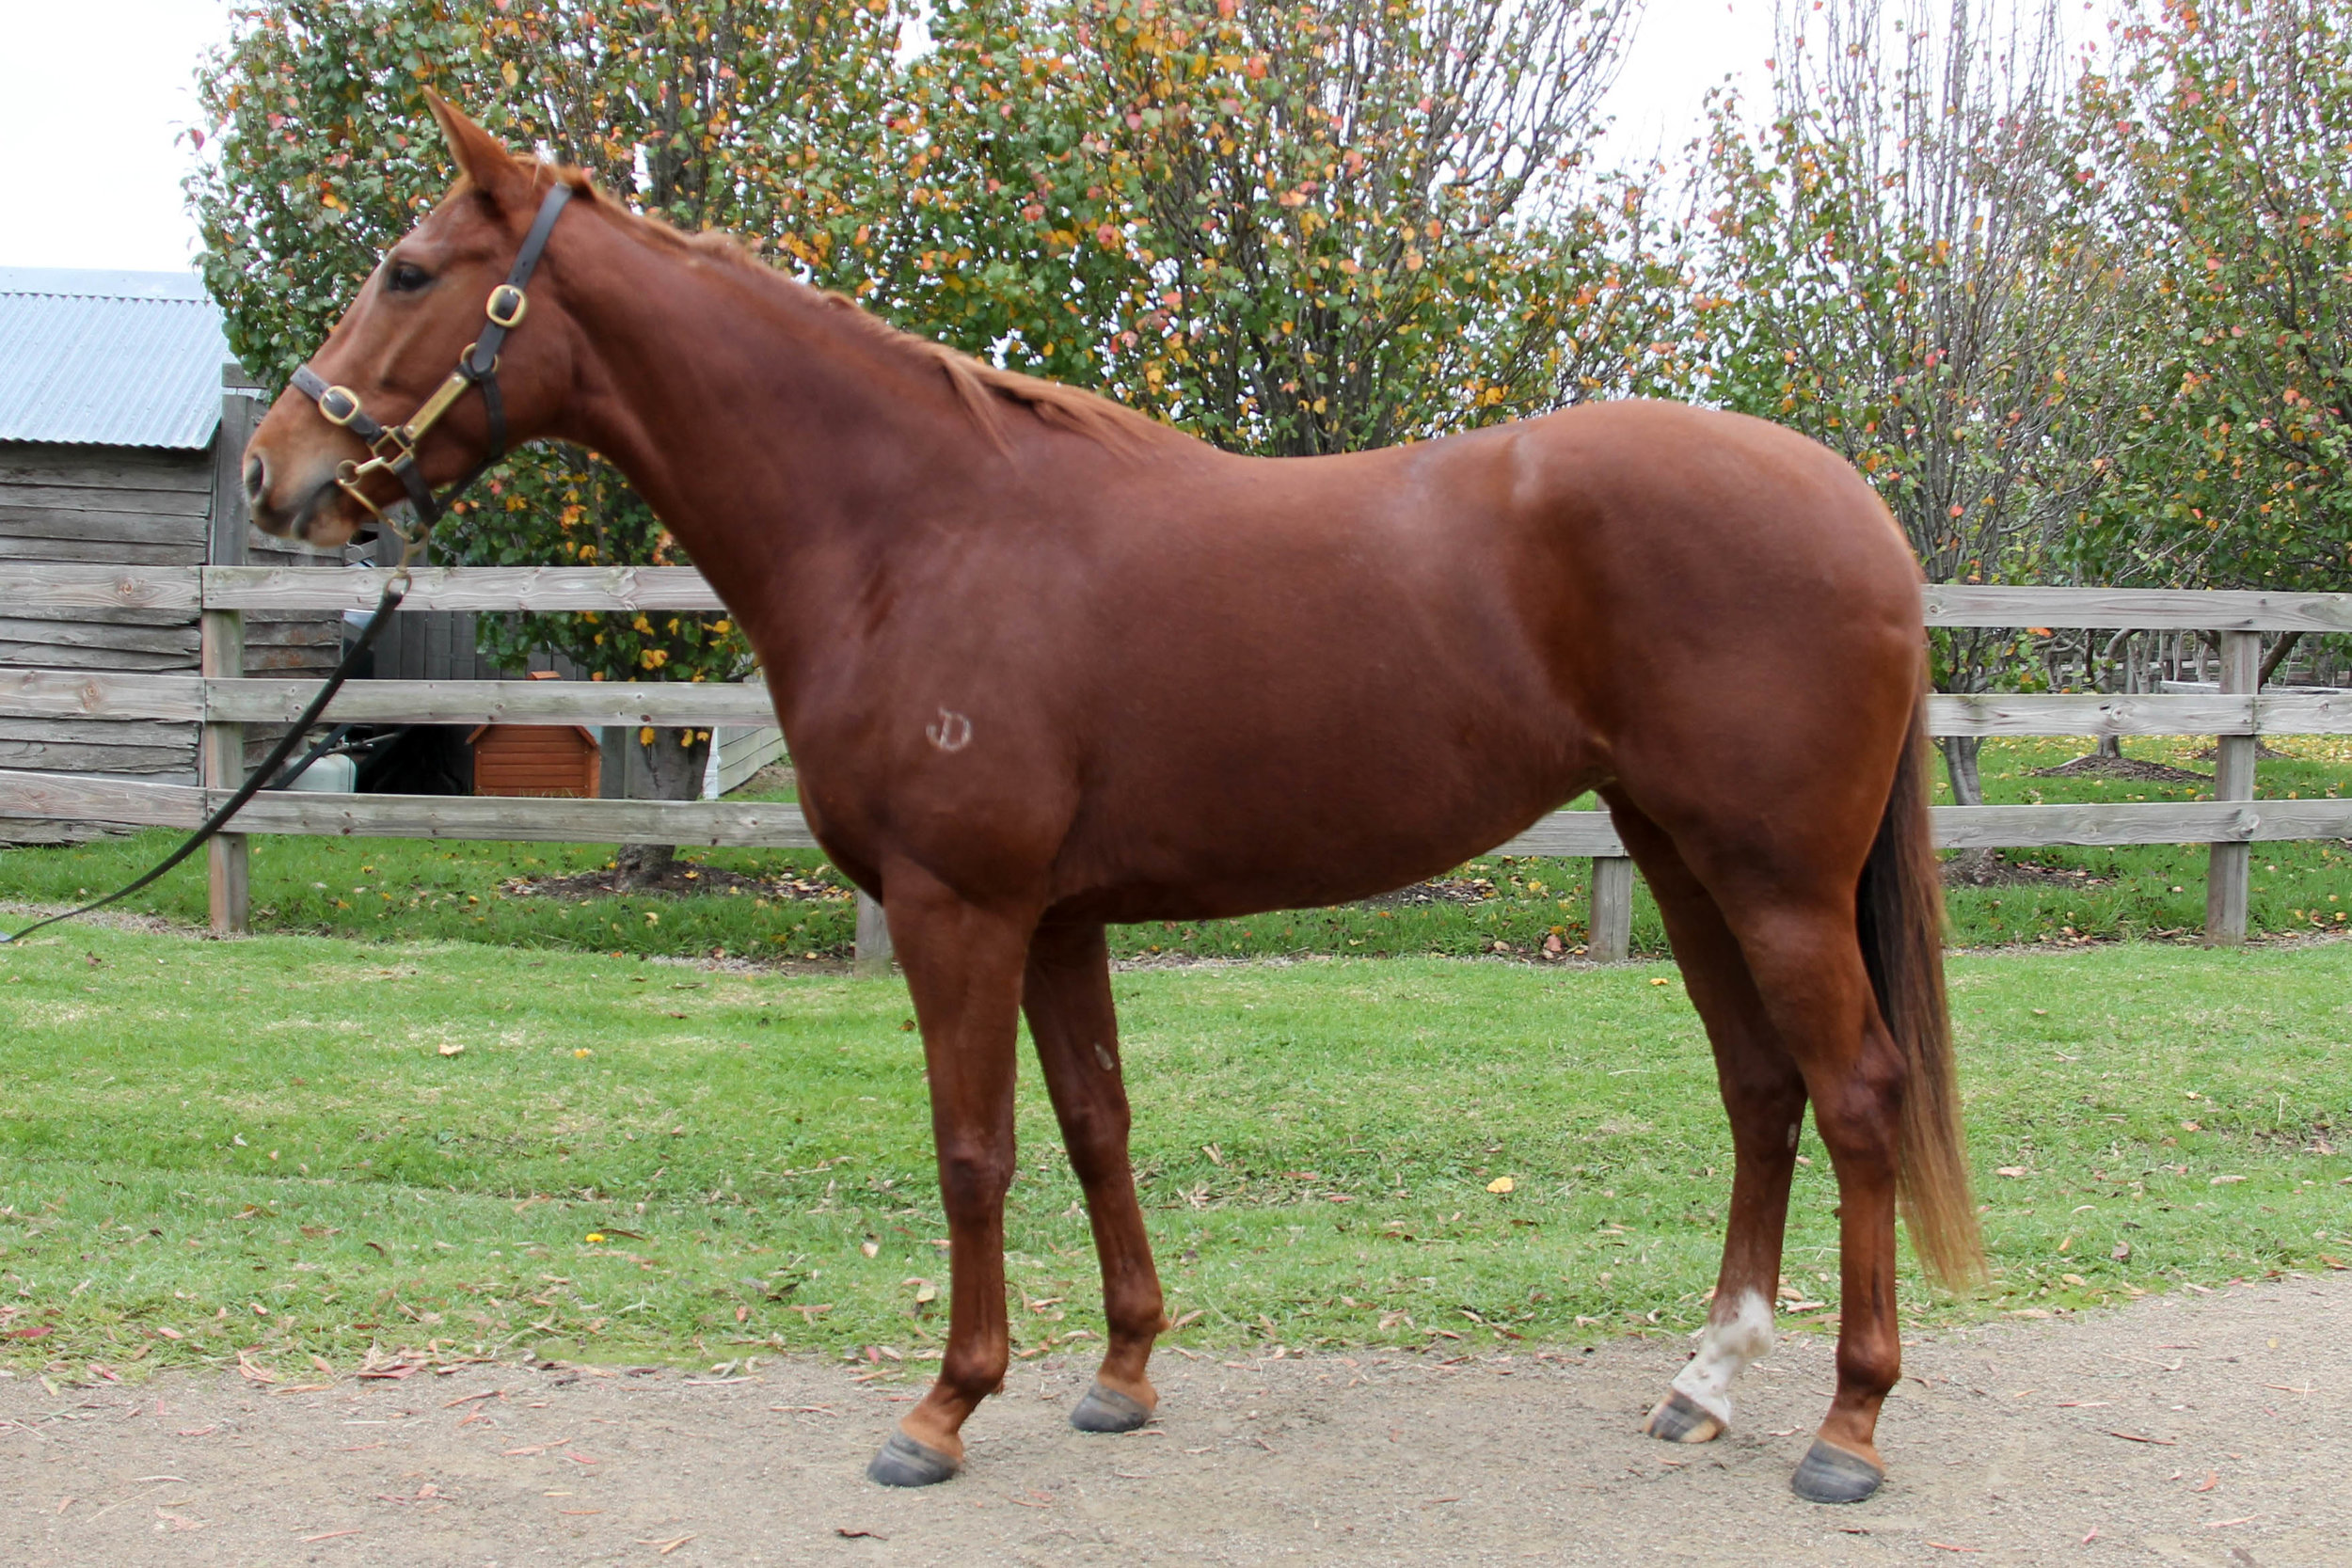 Lot 829 - Elasnik (NZ) - Passed In Reserve $40,000